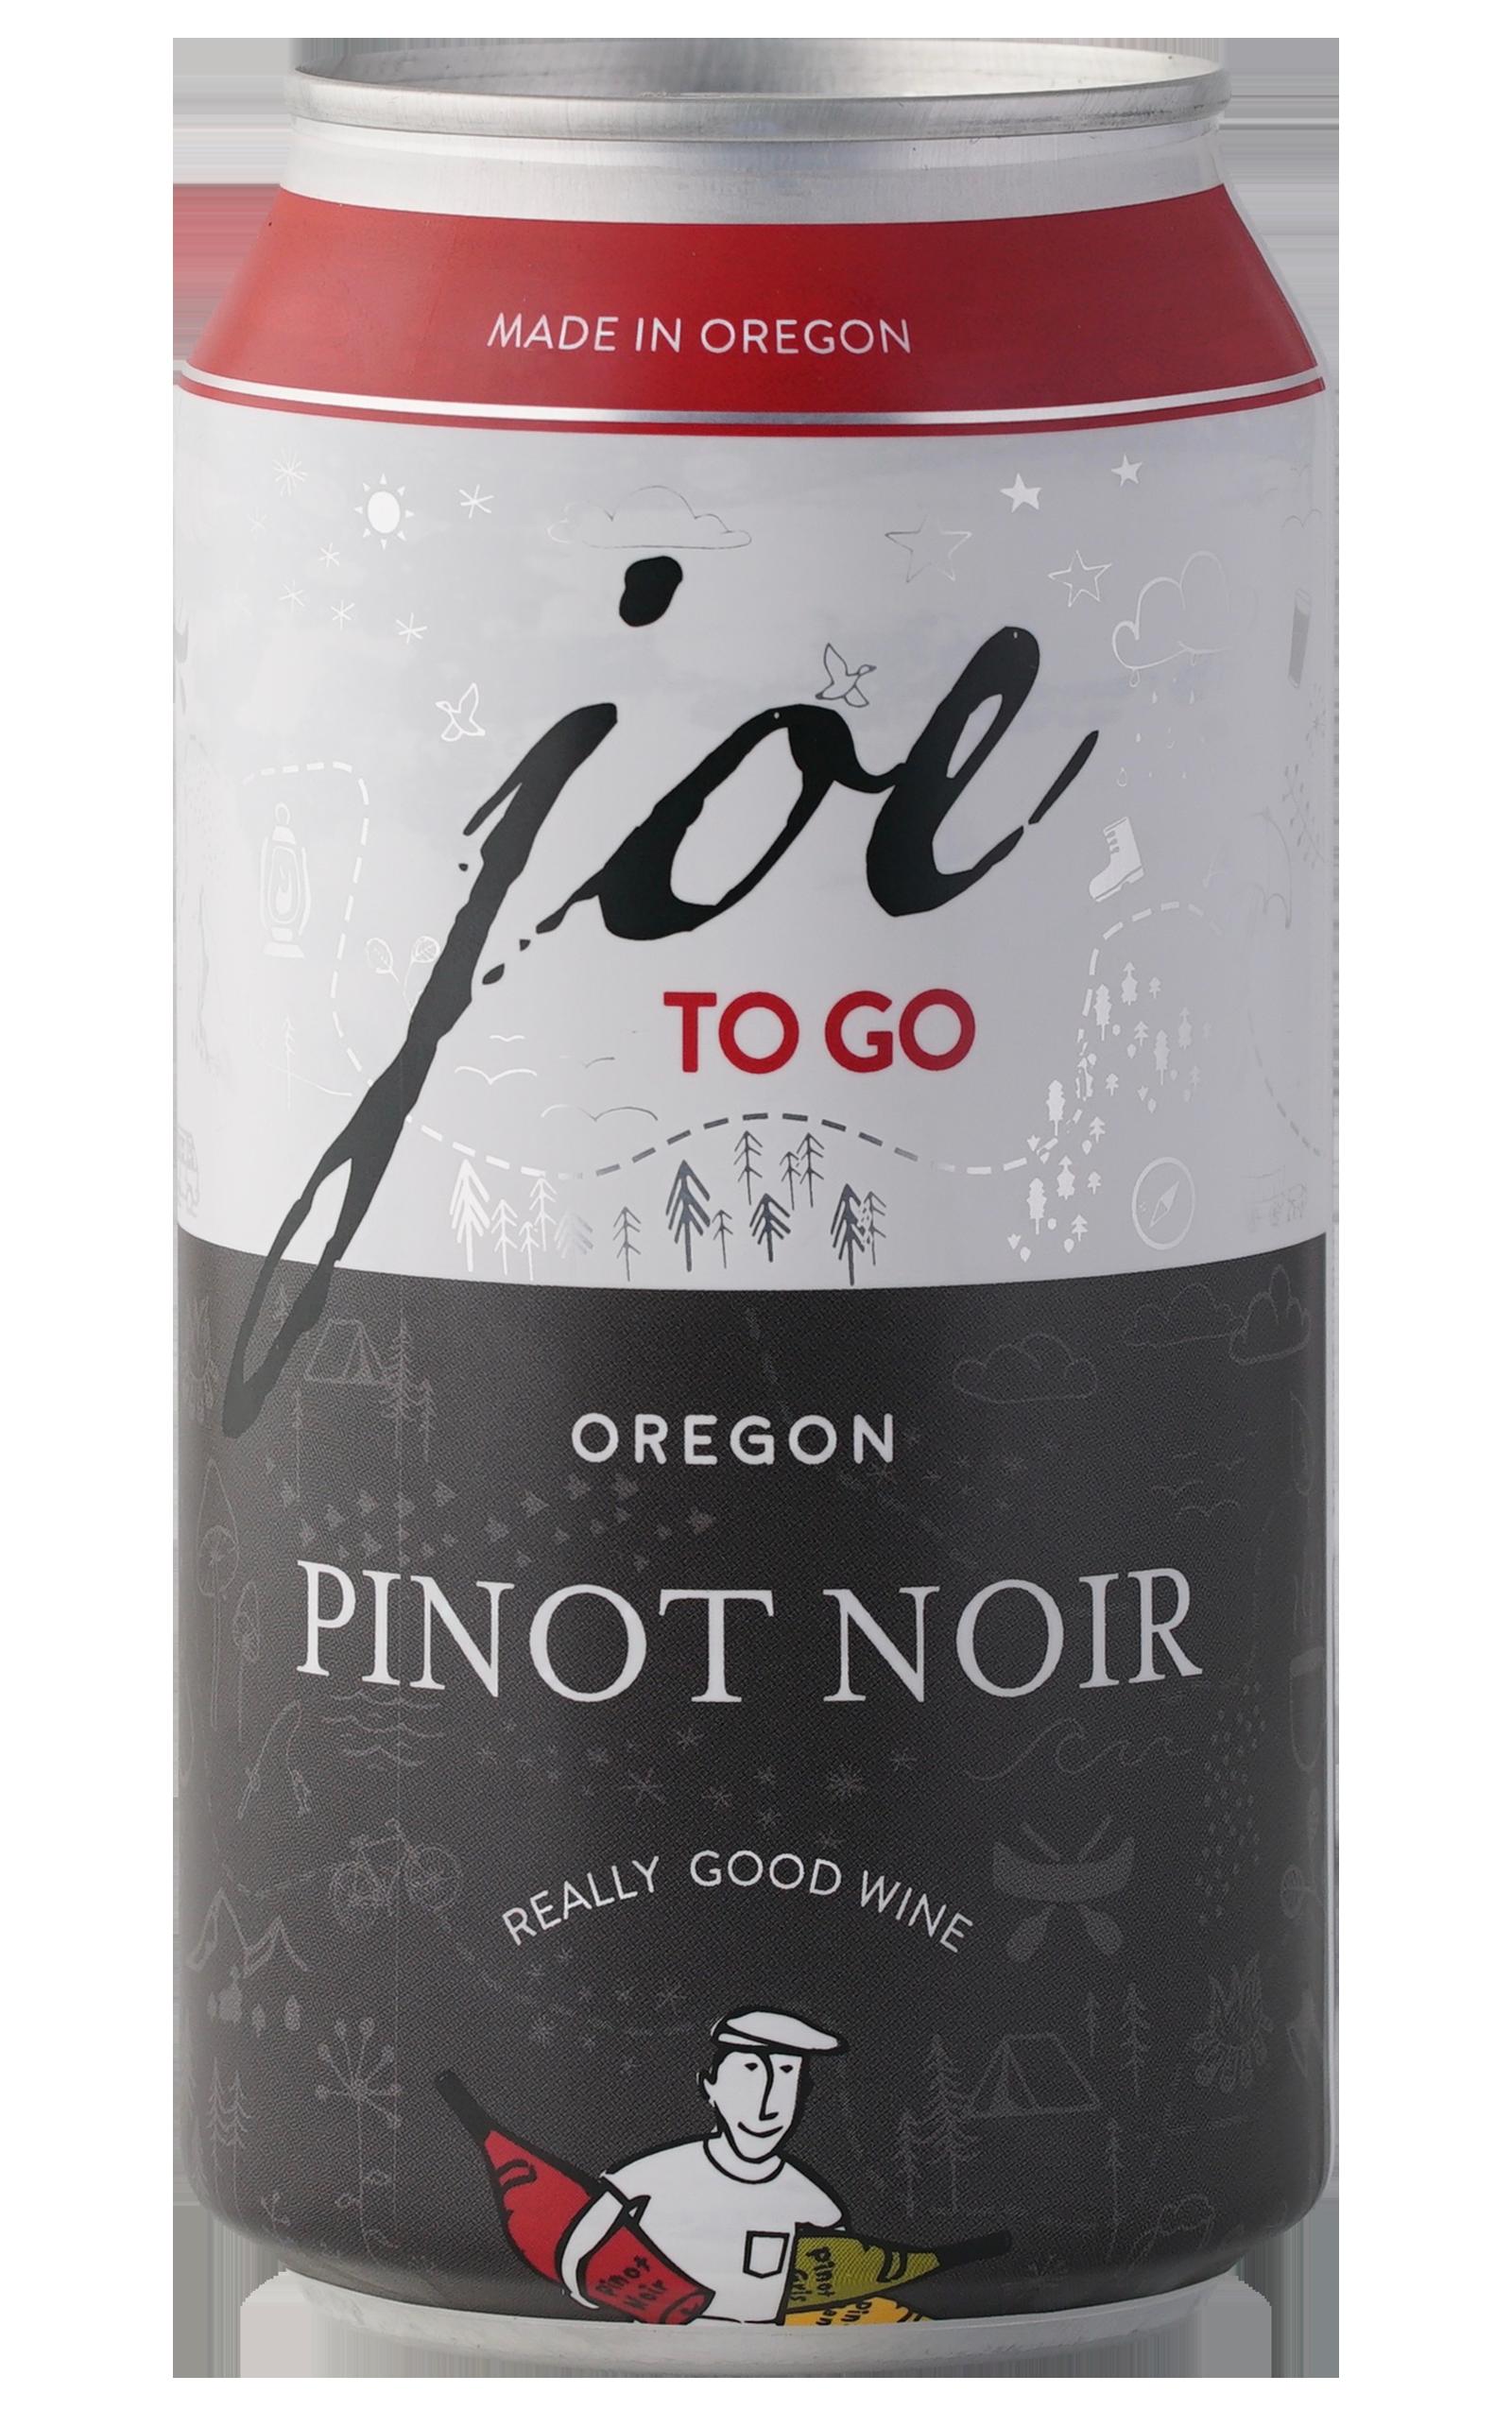 Joe-To-Go-Pinot-Noir